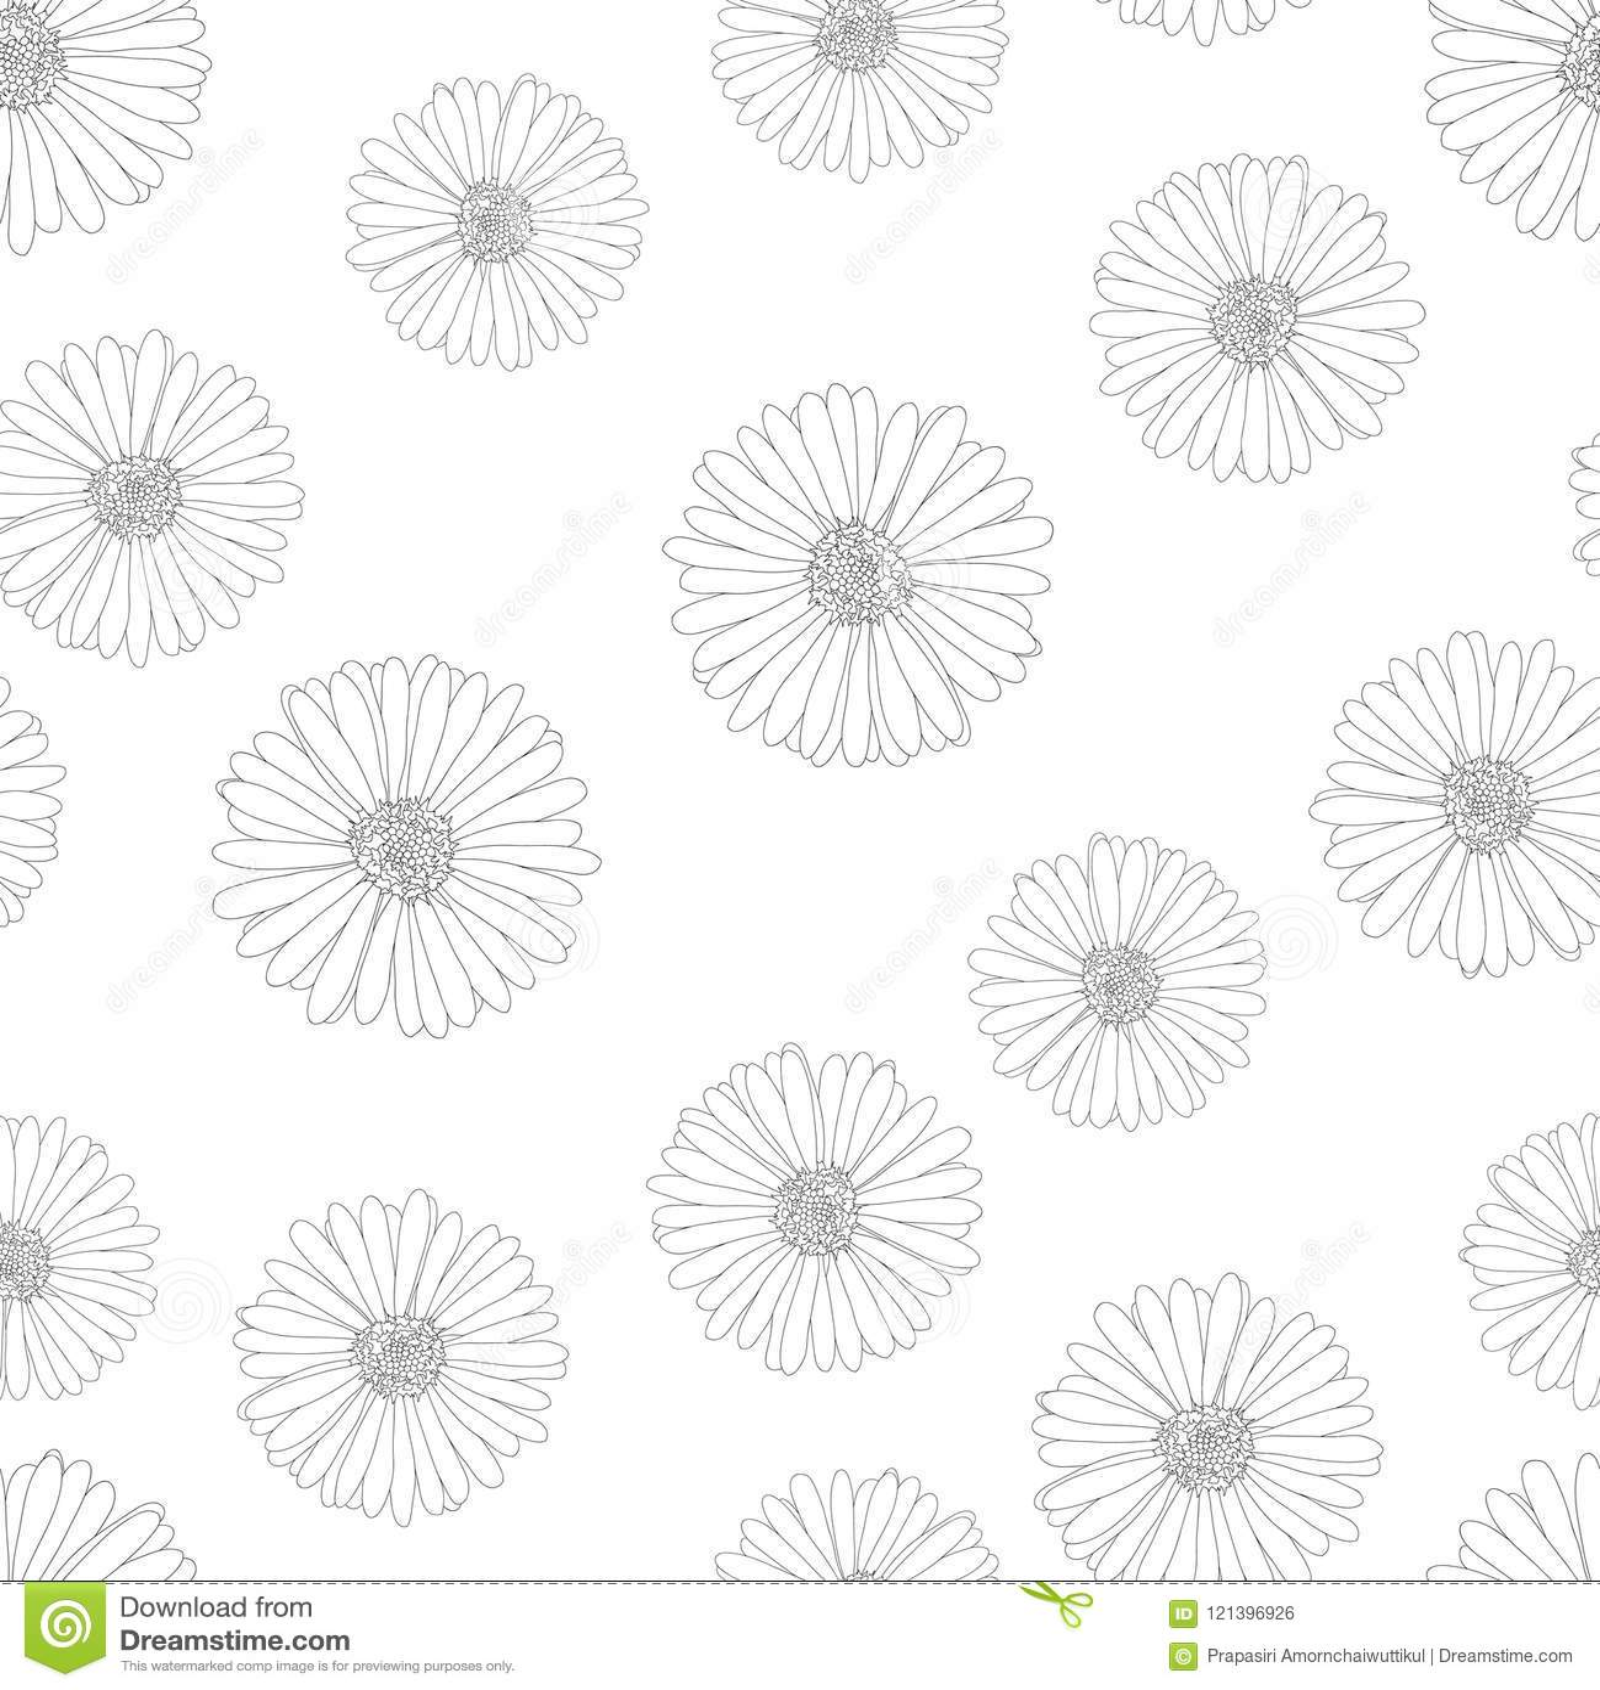 Aster Daisy Flower Outline Seamless Background Vector Illustration